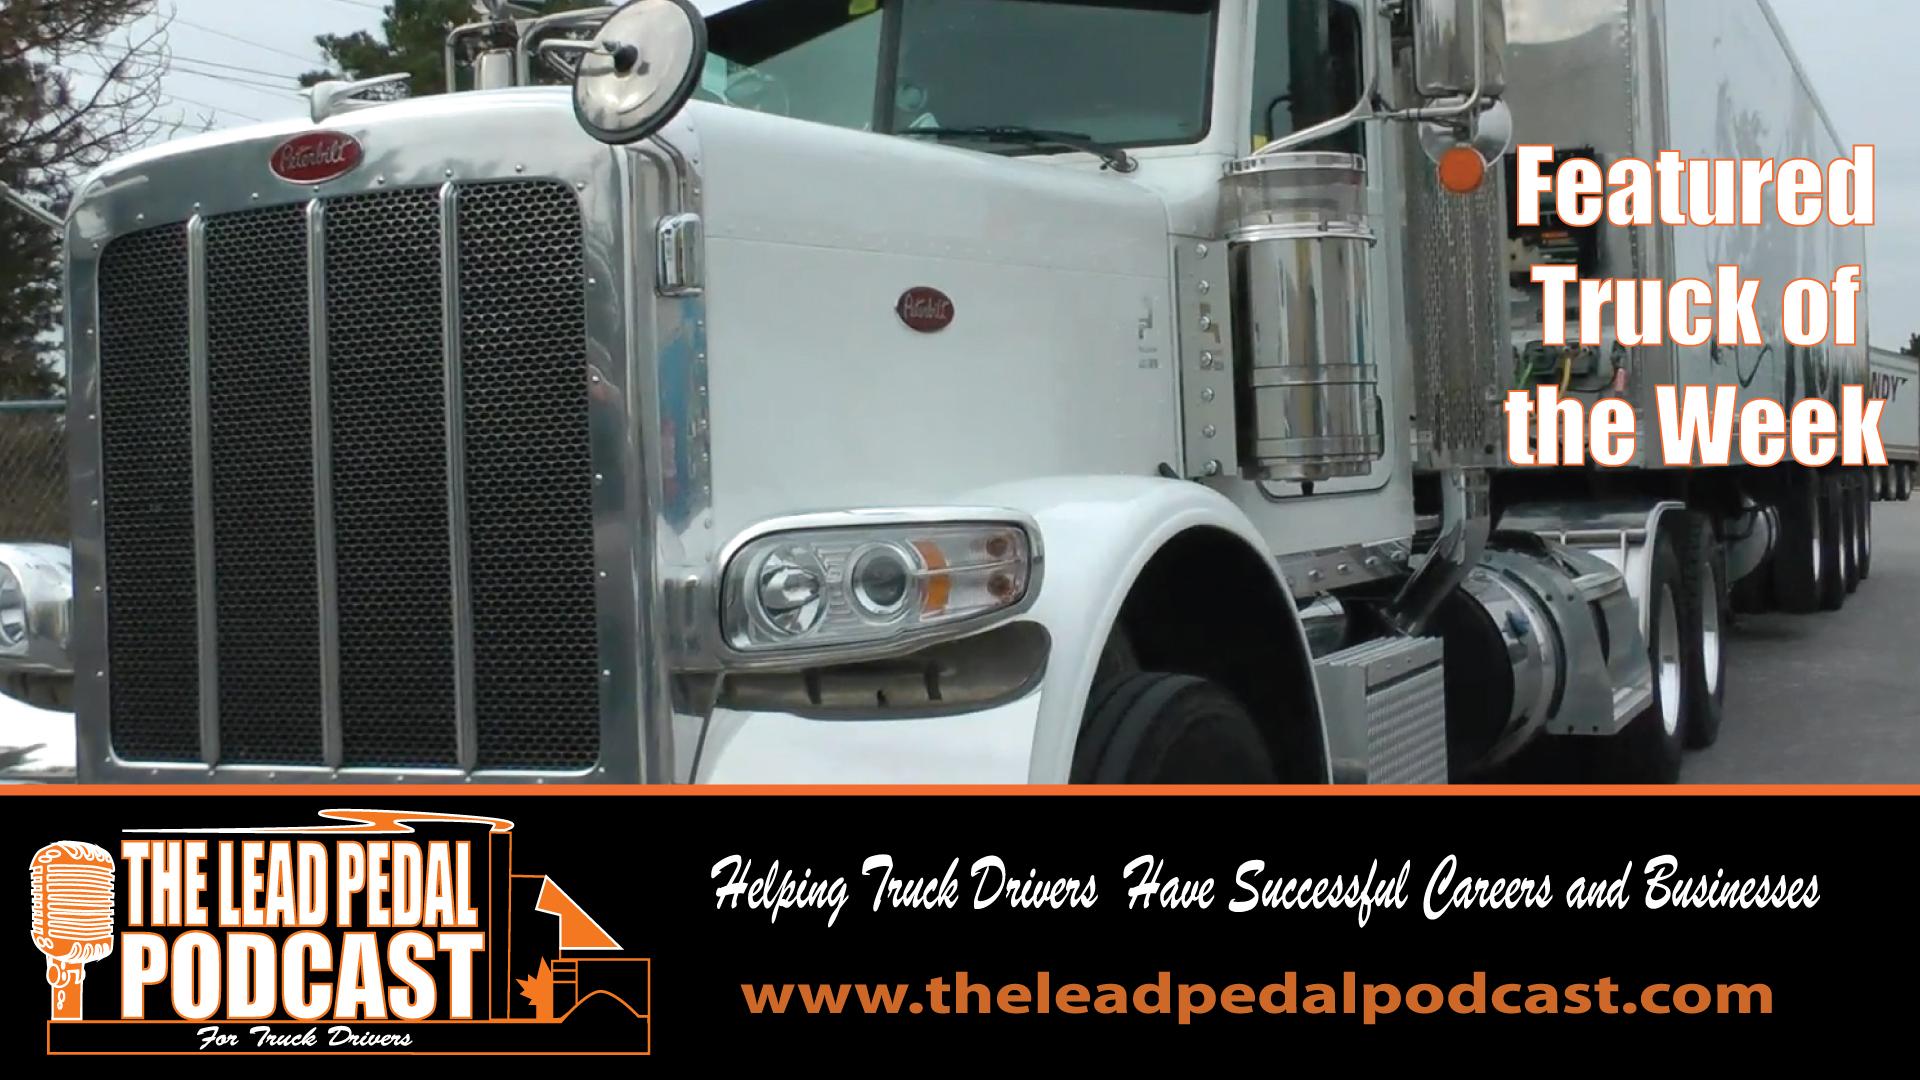 LP663 Featured Truck of the Week Sleeman Peterbilt